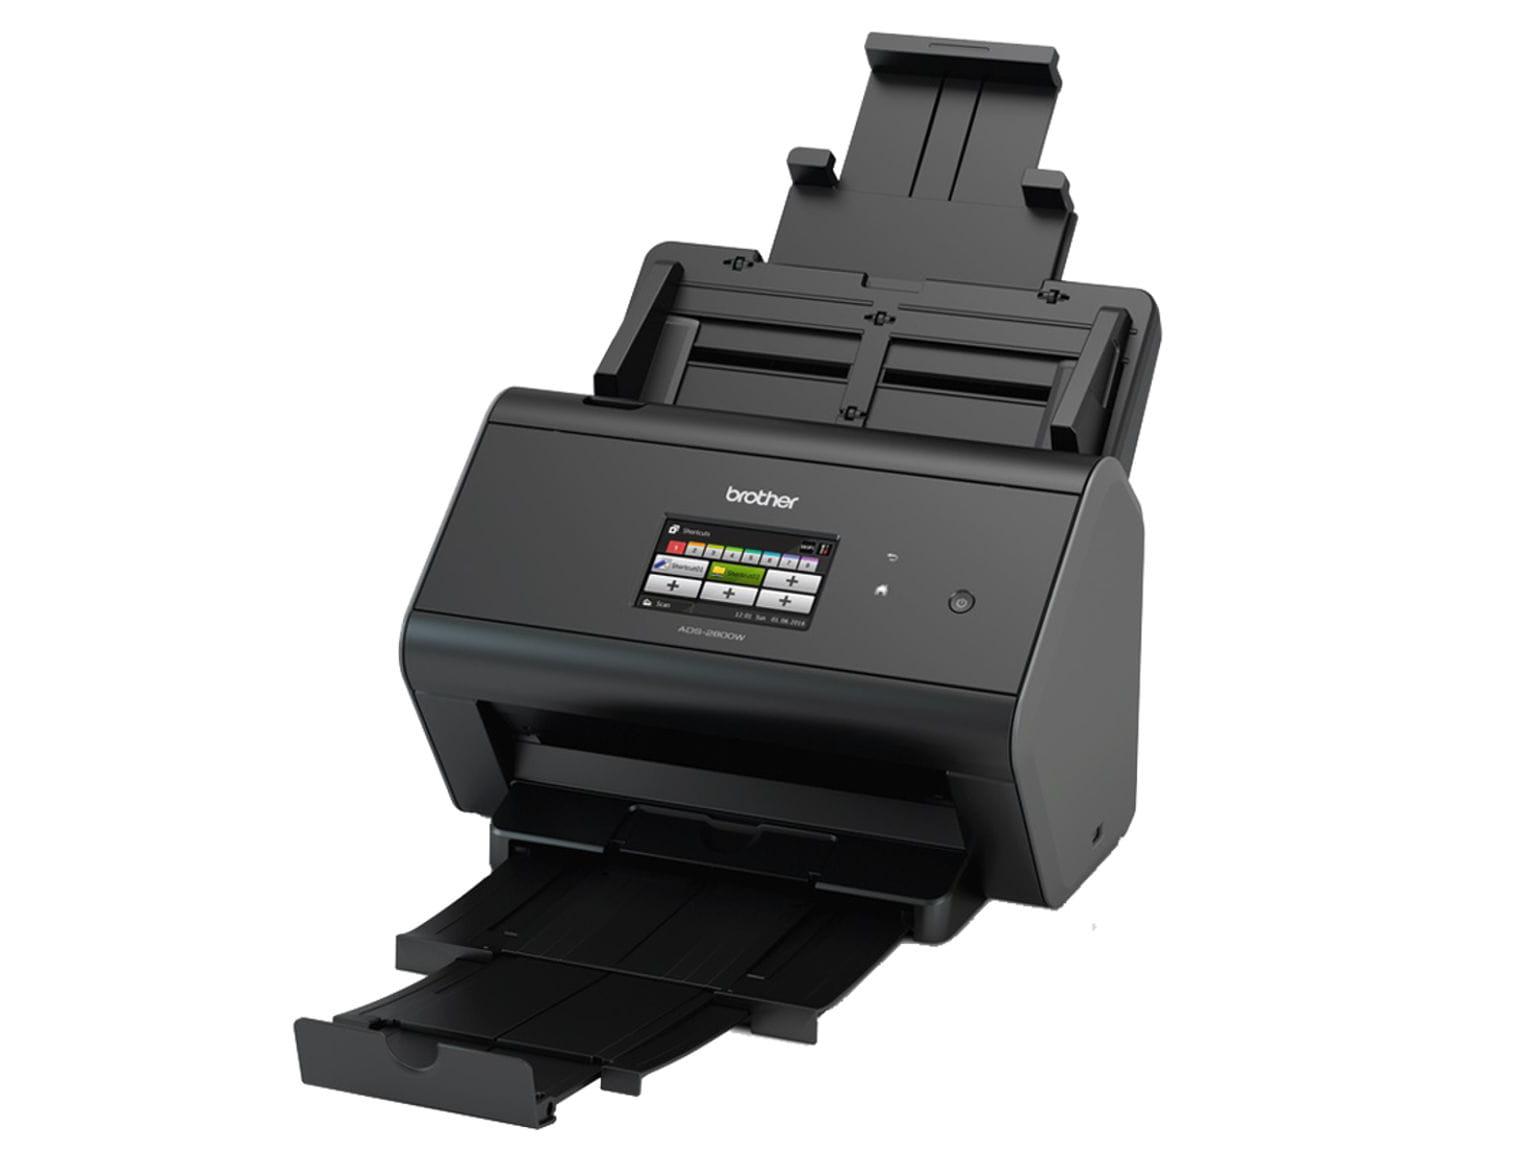 Escáner departamental ADS-2800W Brother